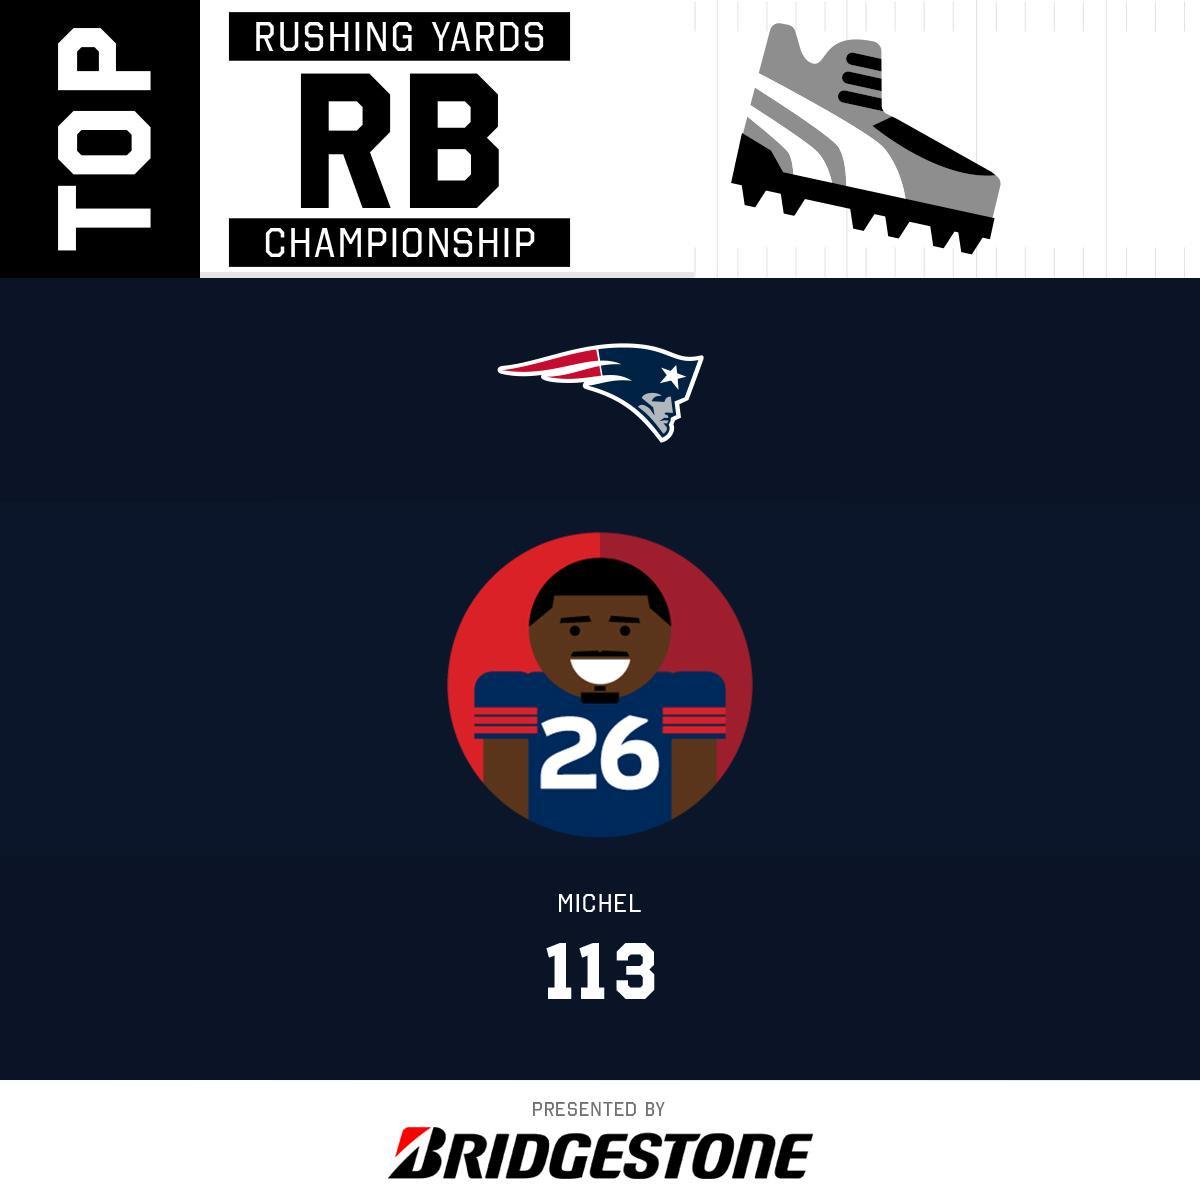 .@Flyguy2stackz's #NFLPlayoffs stats so far: 53 carries. 242 yards. 5 TDs. #EverythingWeGot  (by @Bridgestone)